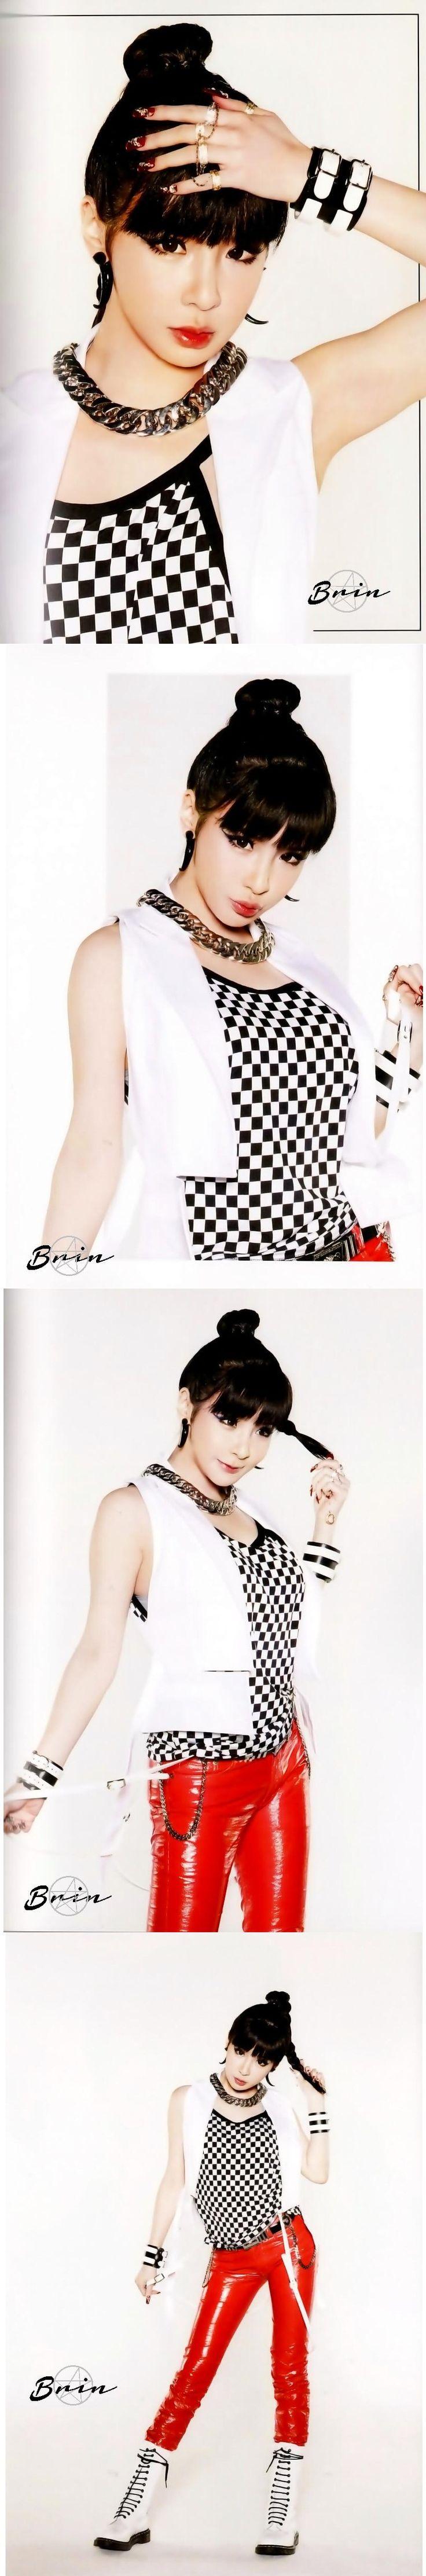 BOM #2NE1CrushJapanAlbum